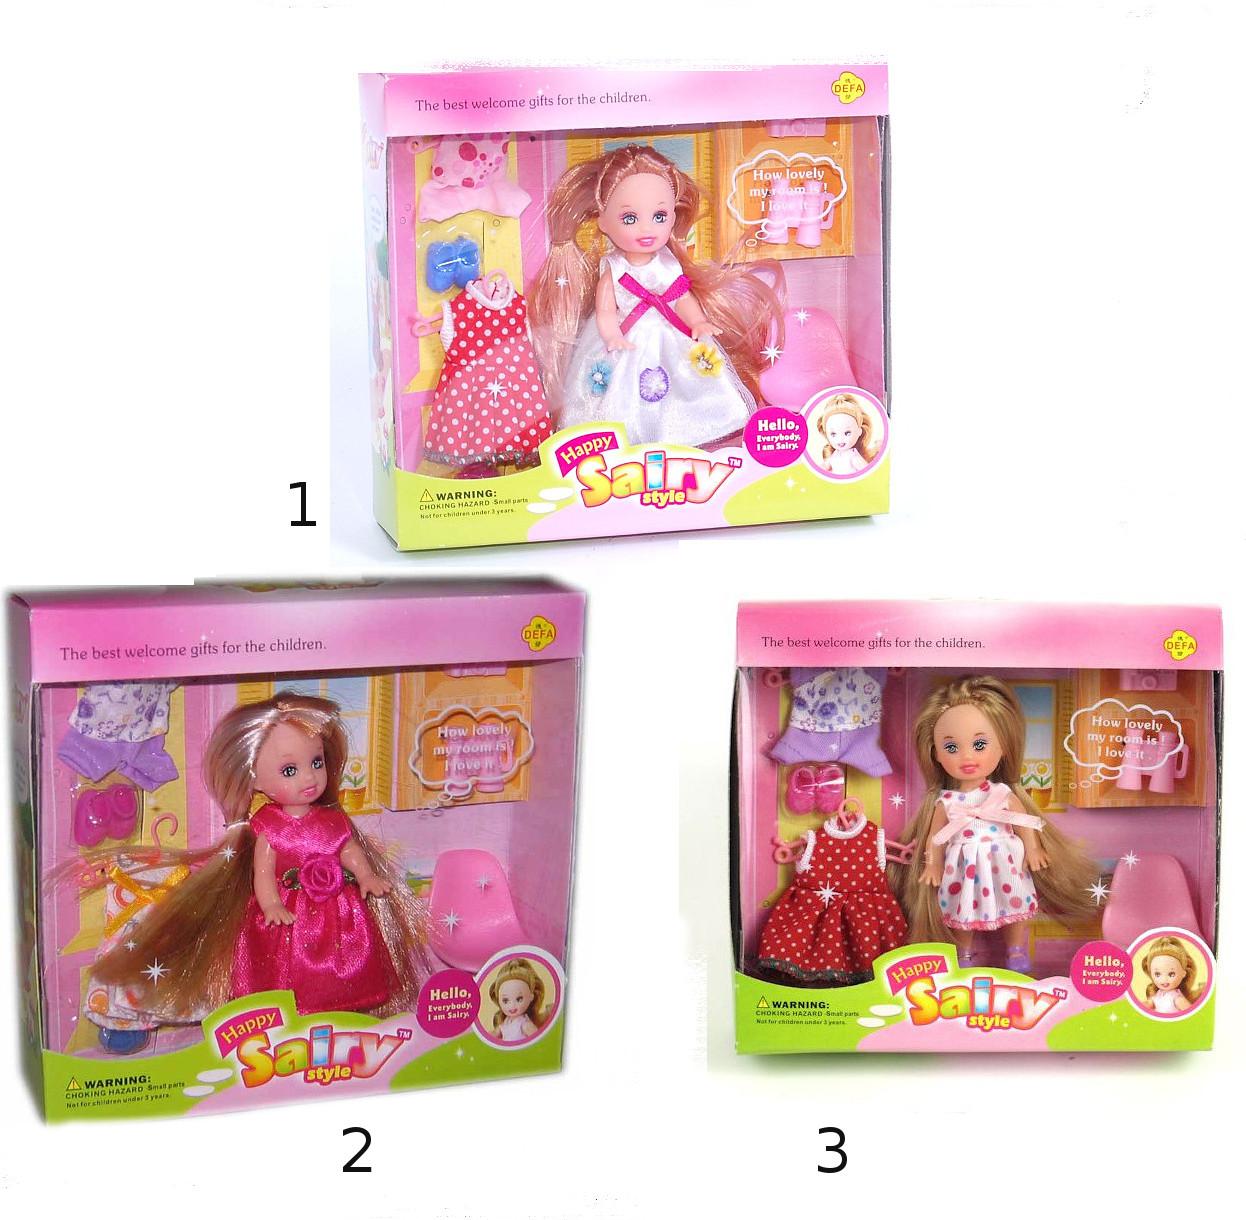 Кукла Сайри в наборе с аксессуарамиКуклы Defa Lucy<br>Кукла Сайри в наборе с аксессуарами<br>